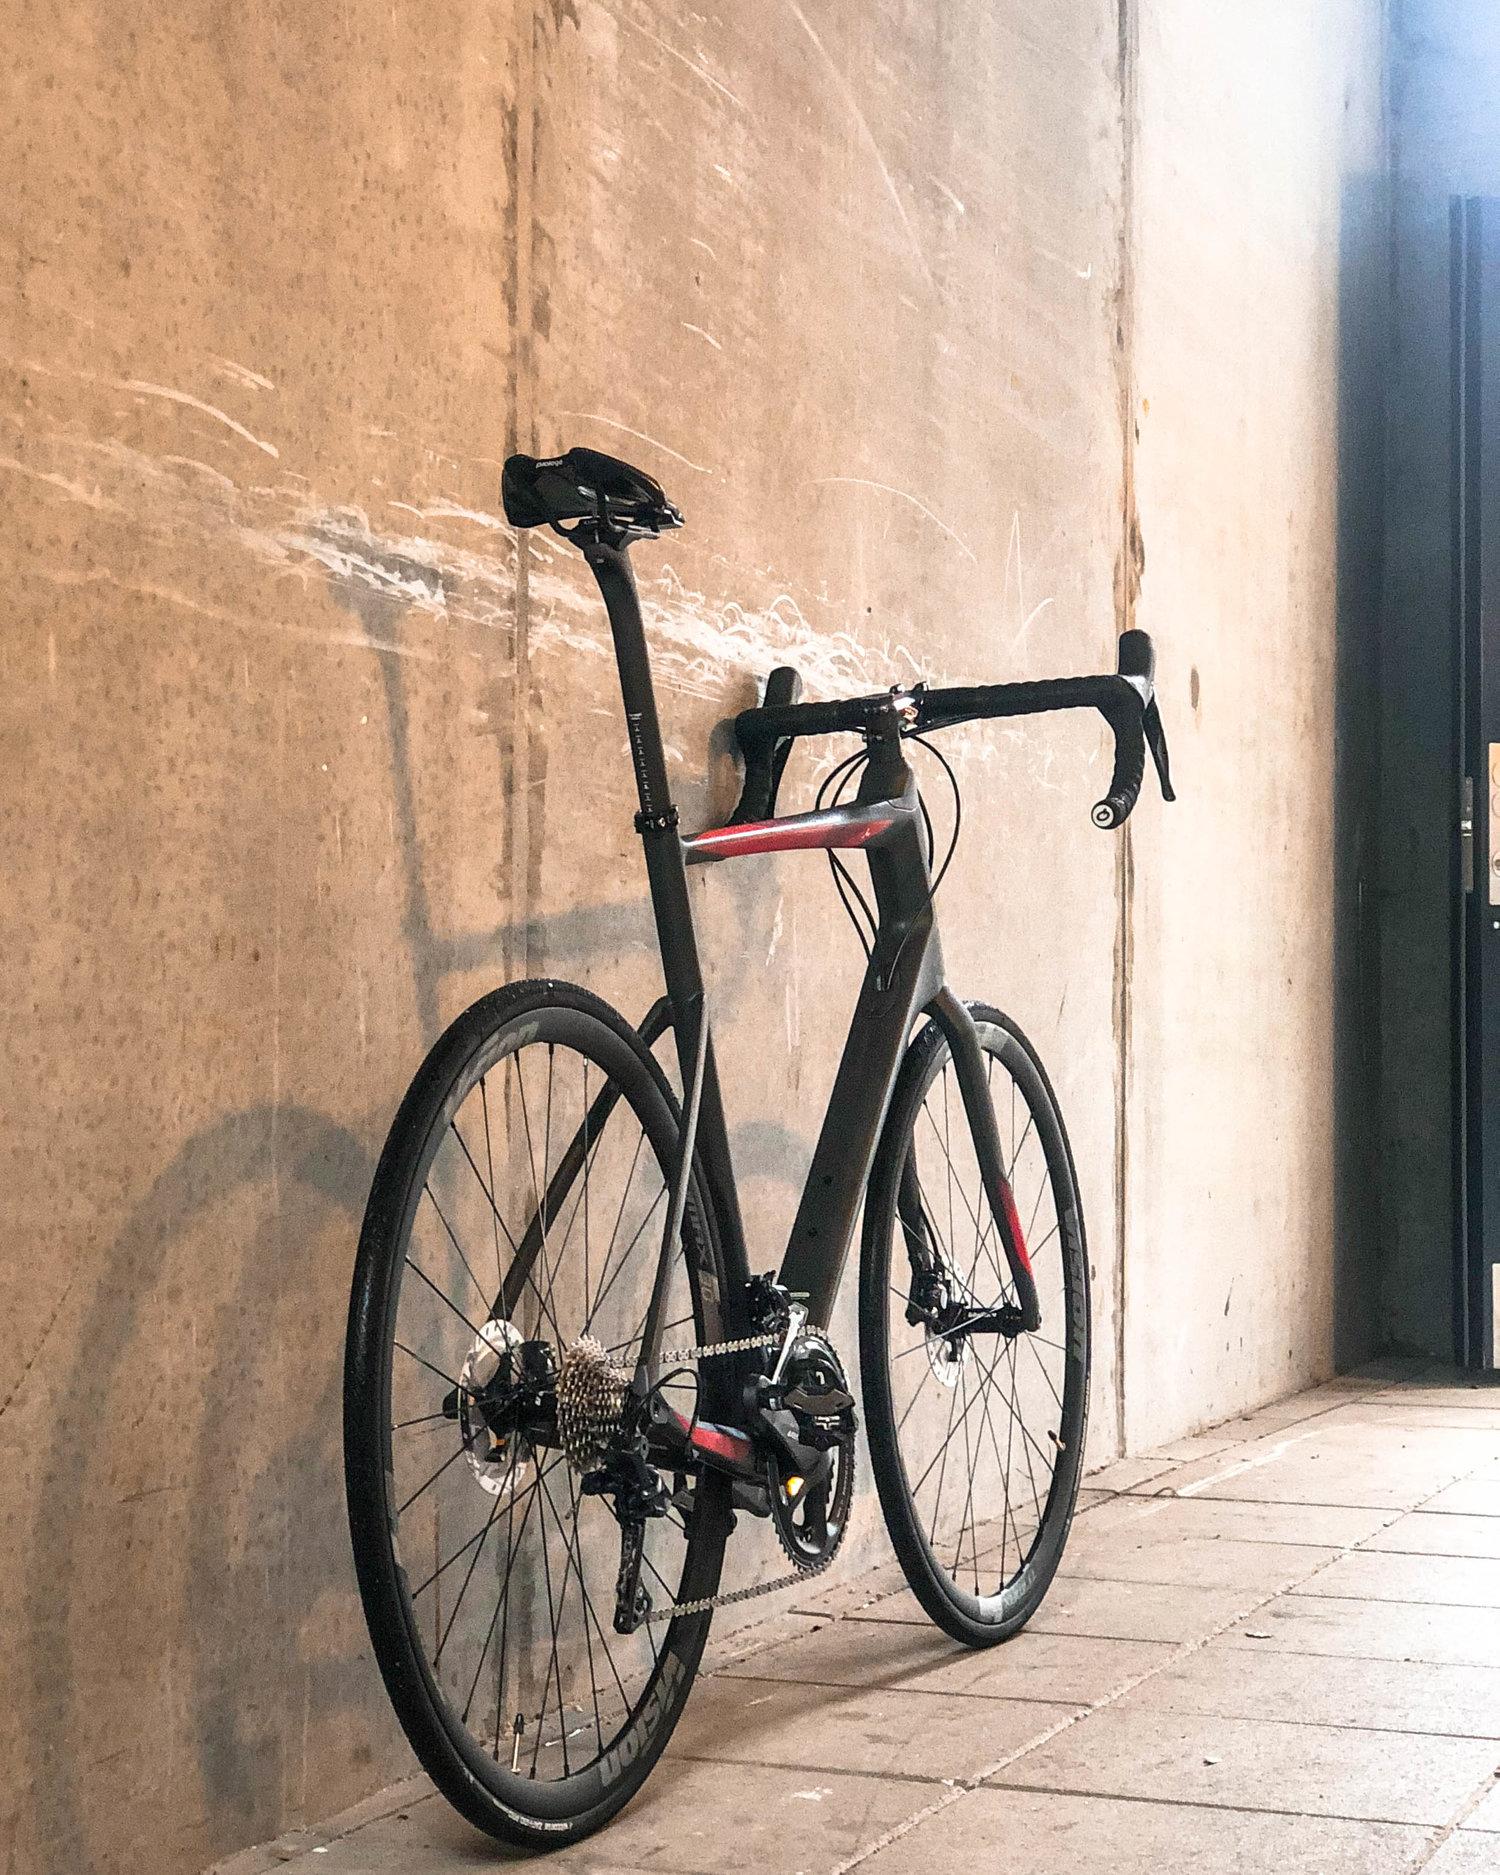 @behindhandlebars's cover photo for 'My New Bike!  — Behind Handlebars'